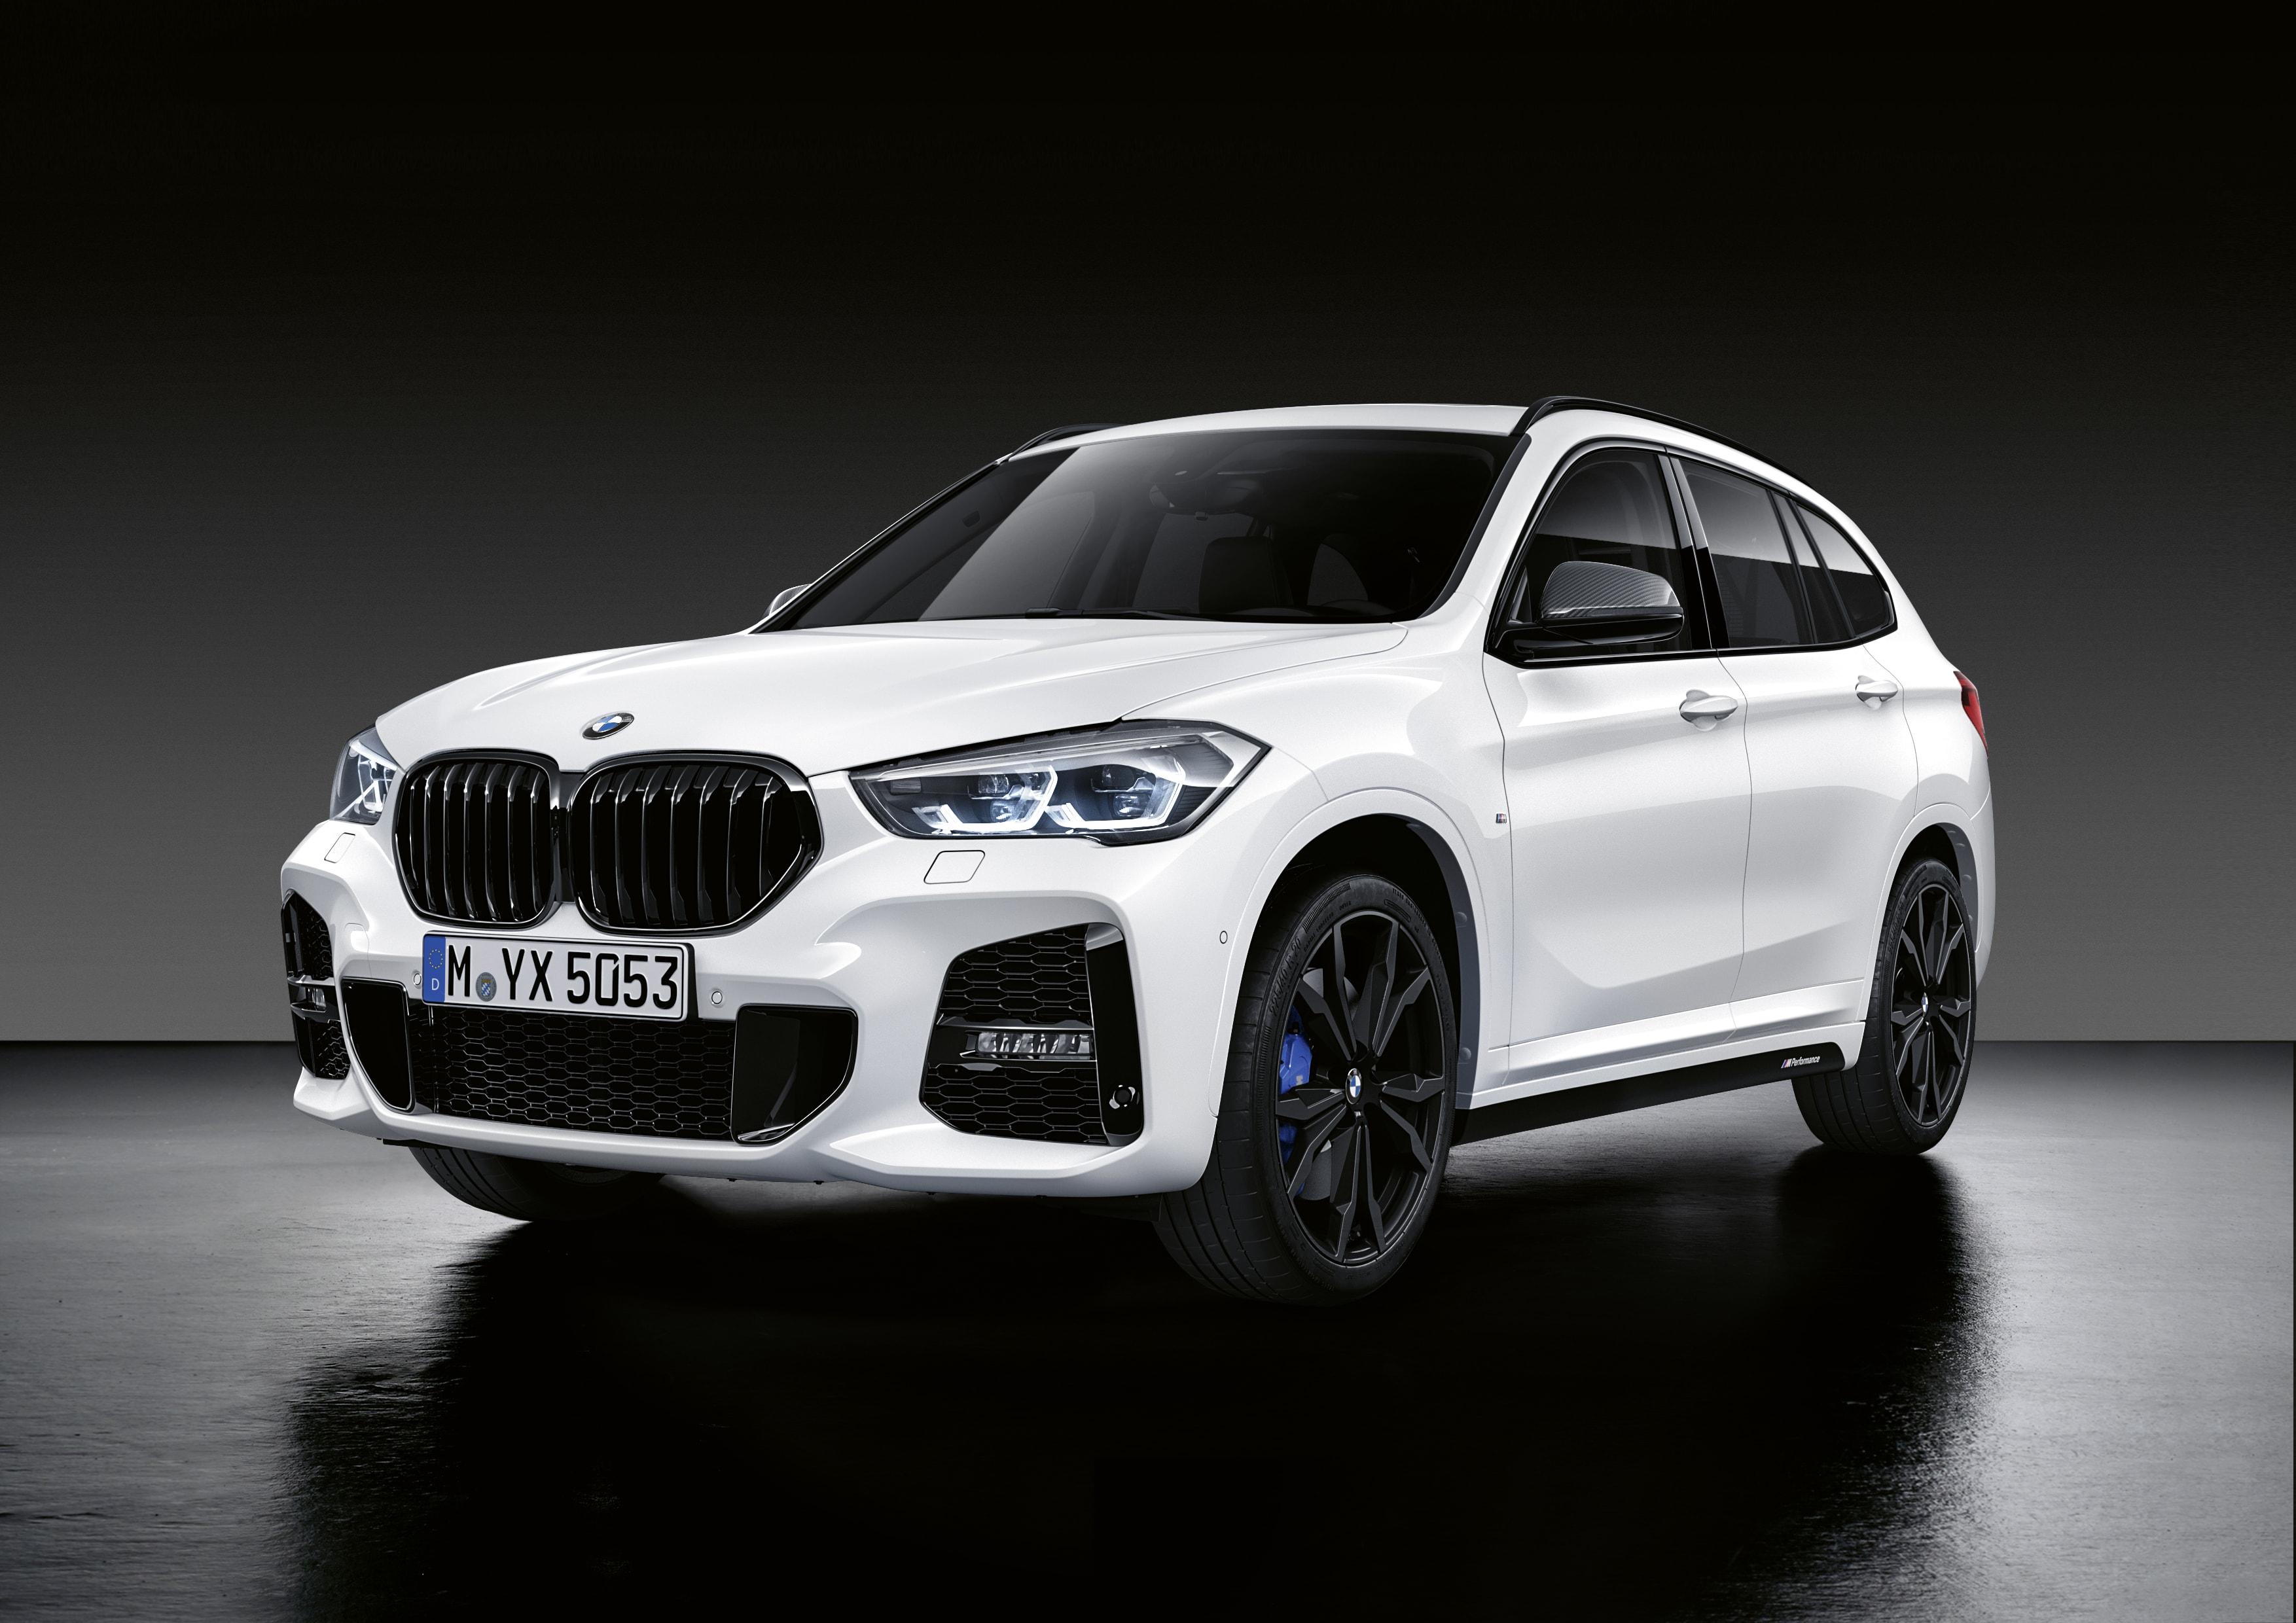 XCREW: Accesoriza tu BMW X con la línea M performance.